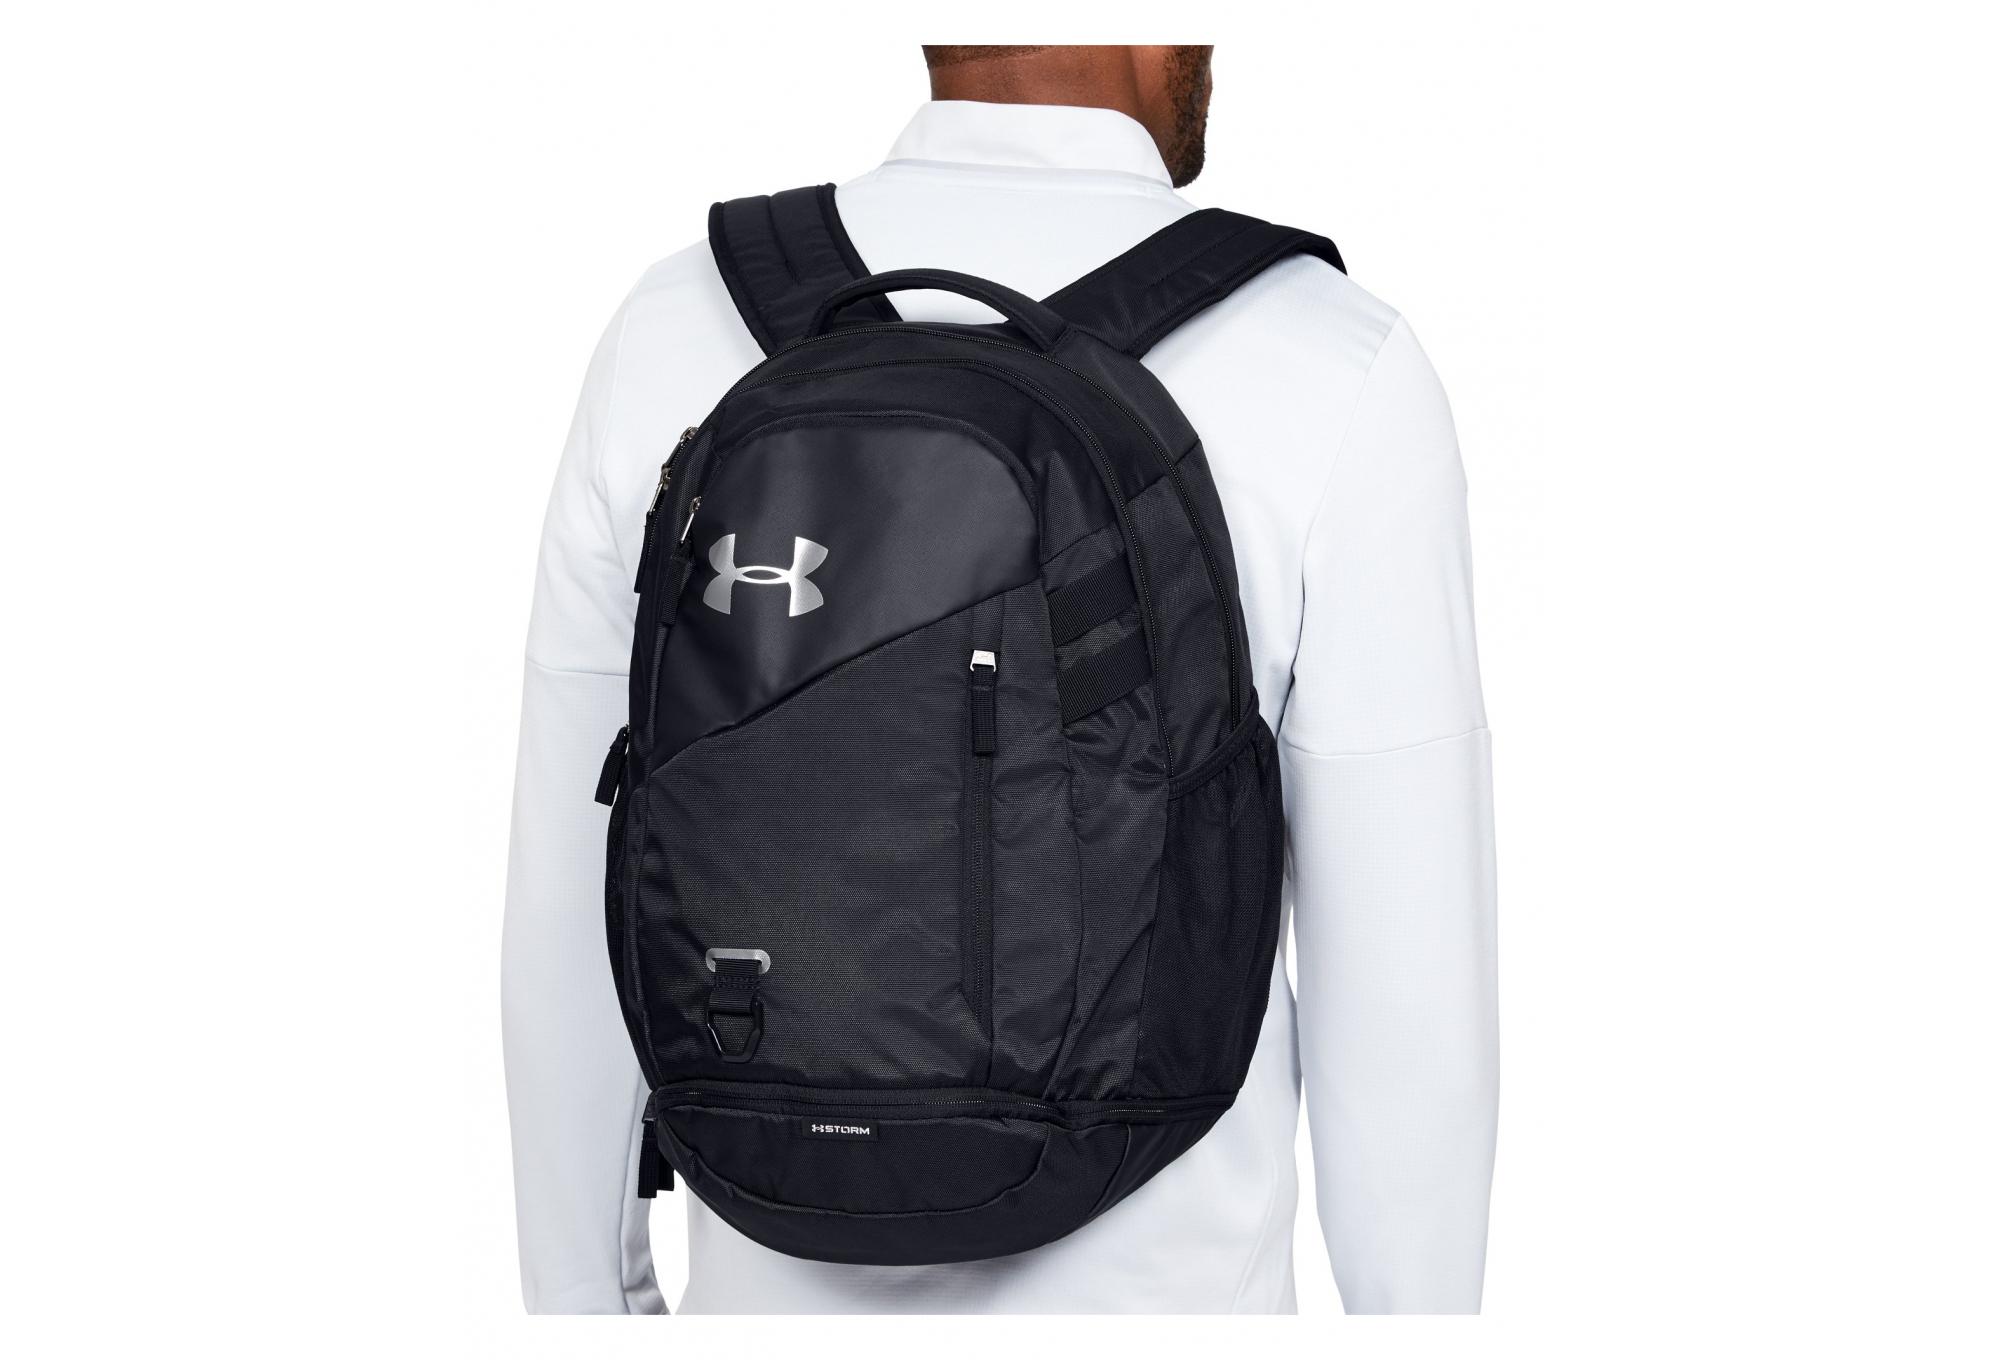 Isaac Distribución Tumba  Under Armour Hustle 4.0 Backpack Black | Alltricks.com